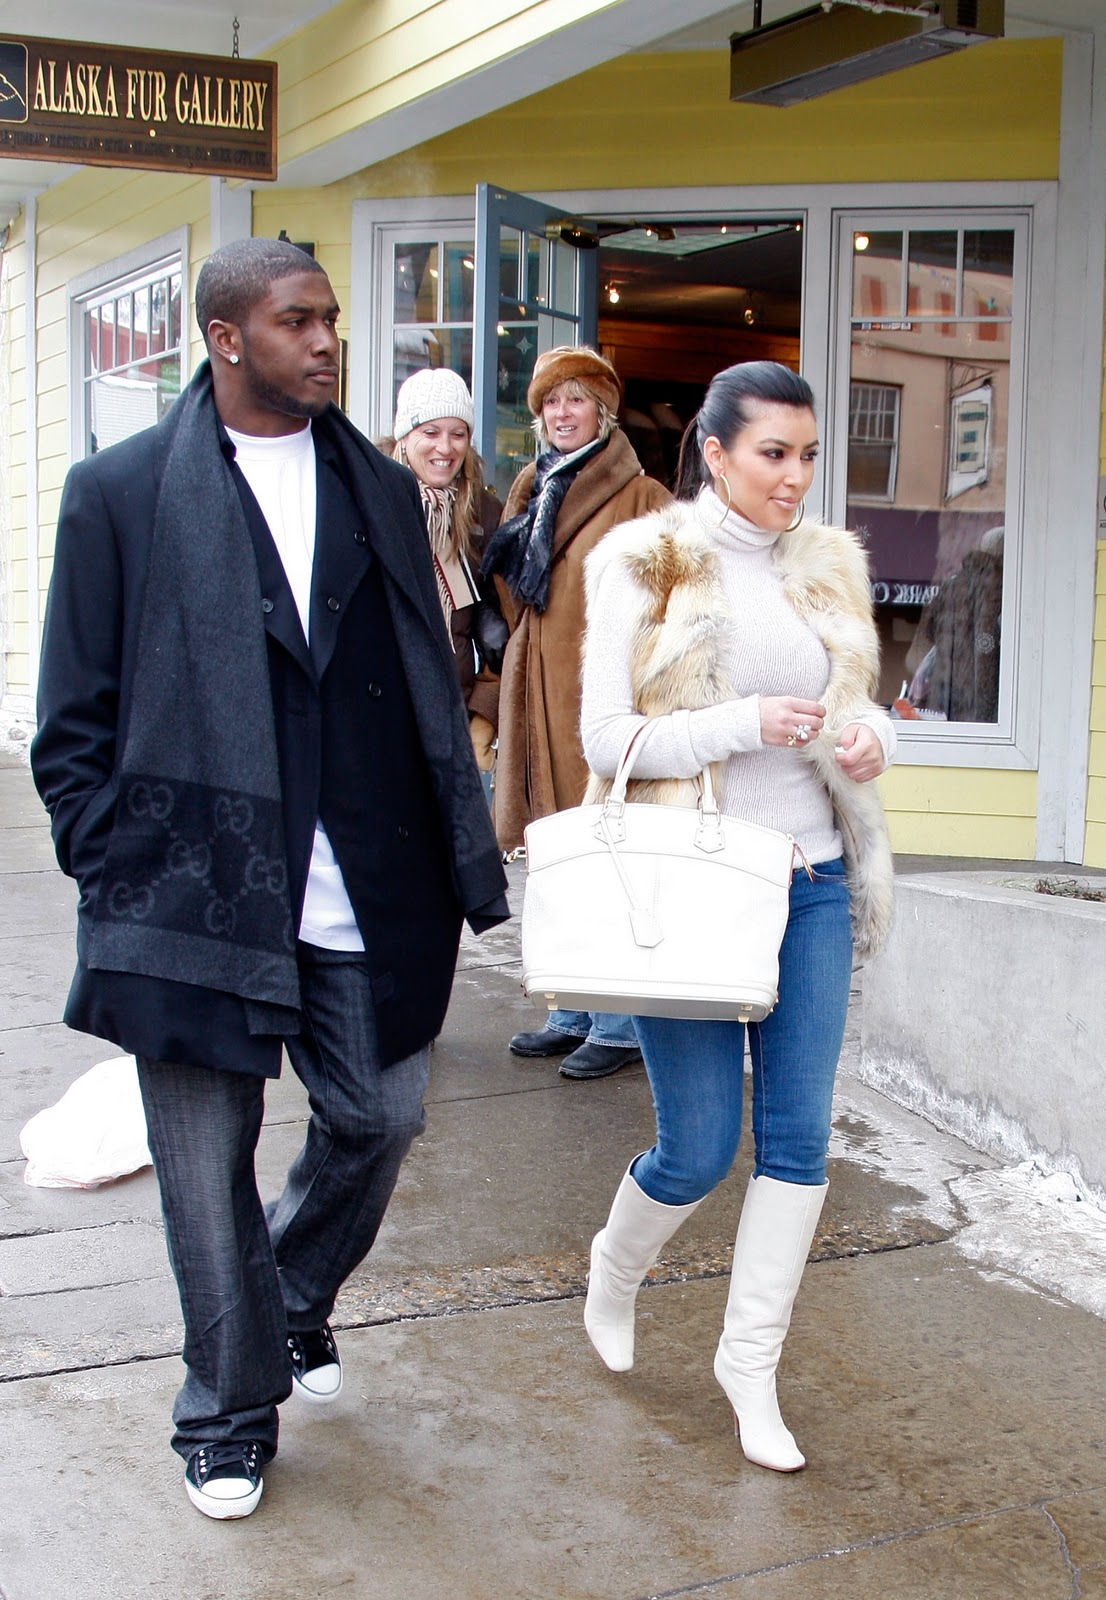 http://2.bp.blogspot.com/_LRzFEyAOGAA/TQnL_J1IimI/AAAAAAAAD14/ykK6lnfV1zM/s1600/85951_celeb-city.org-Kim_Kardashian-2008_Sundance_Film_Festival_Day_333_122_43lo.jpg